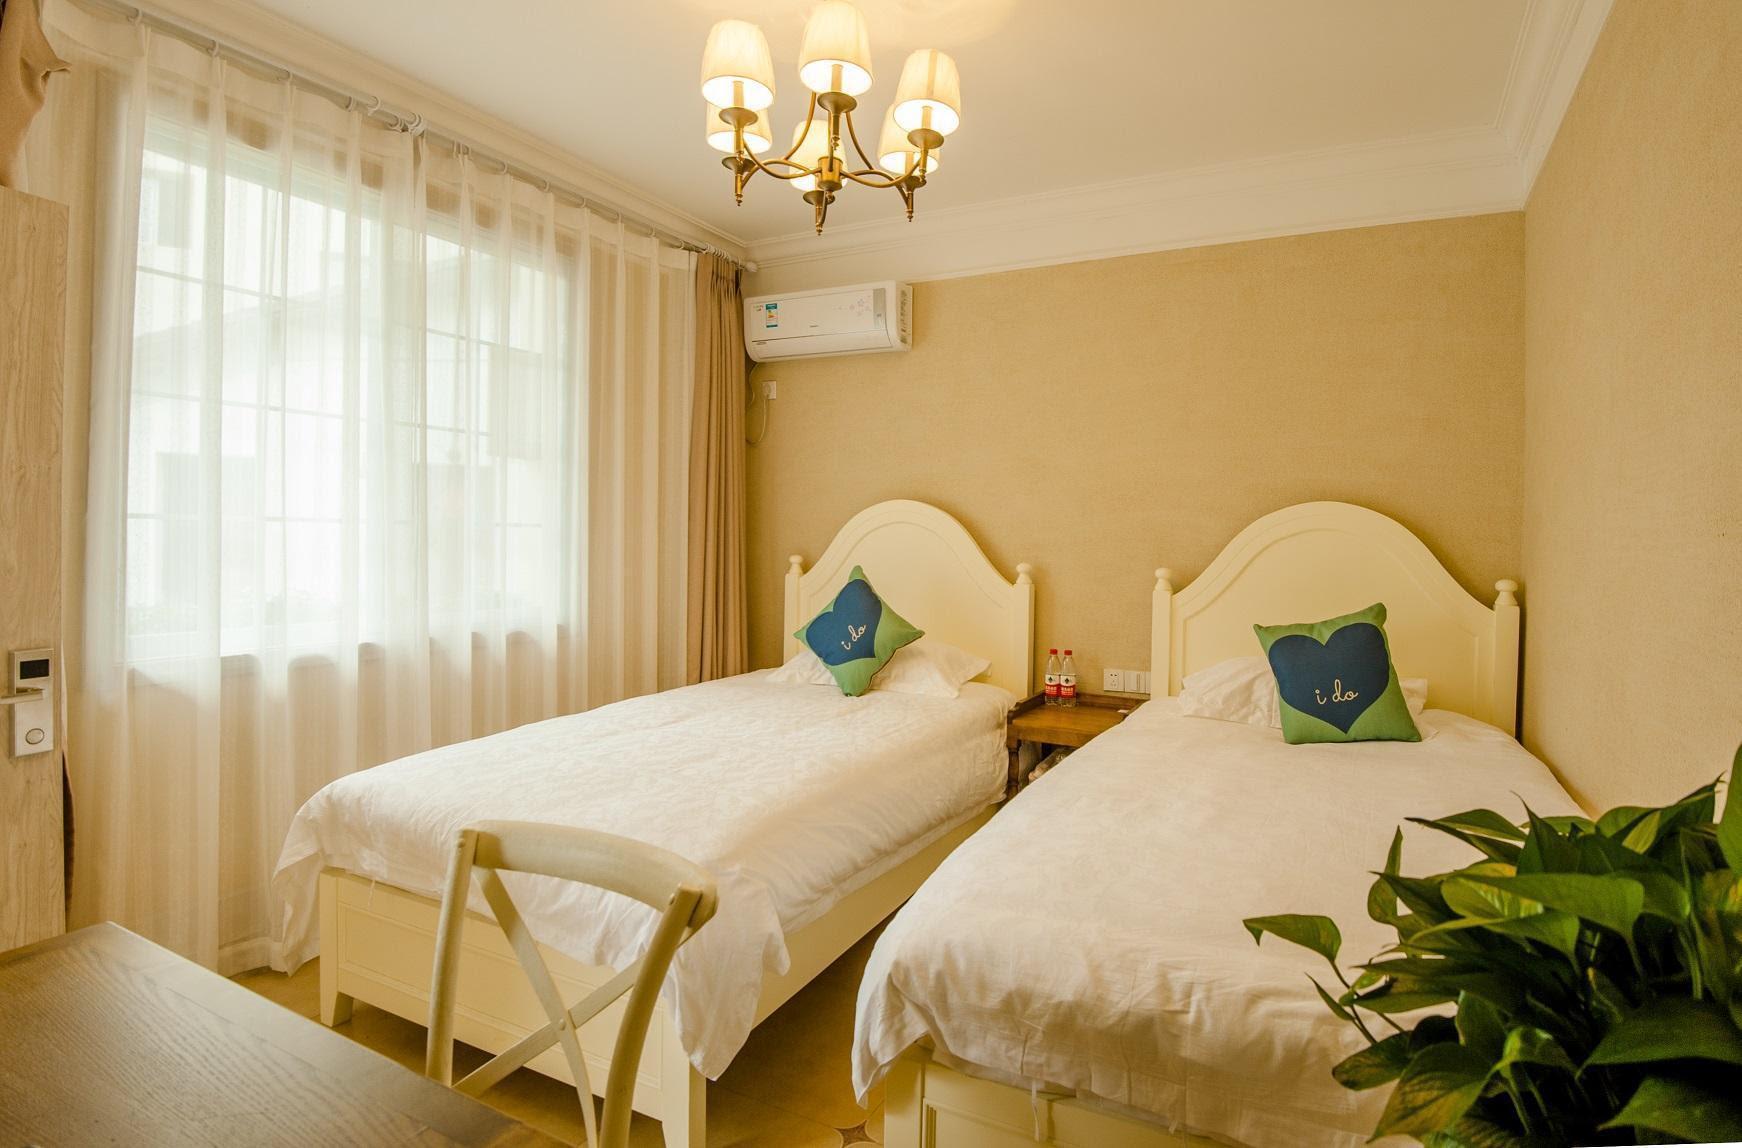 hotel near Hangzhou YUNQI XIAOZHU STAY Private Studio with 2 Beds